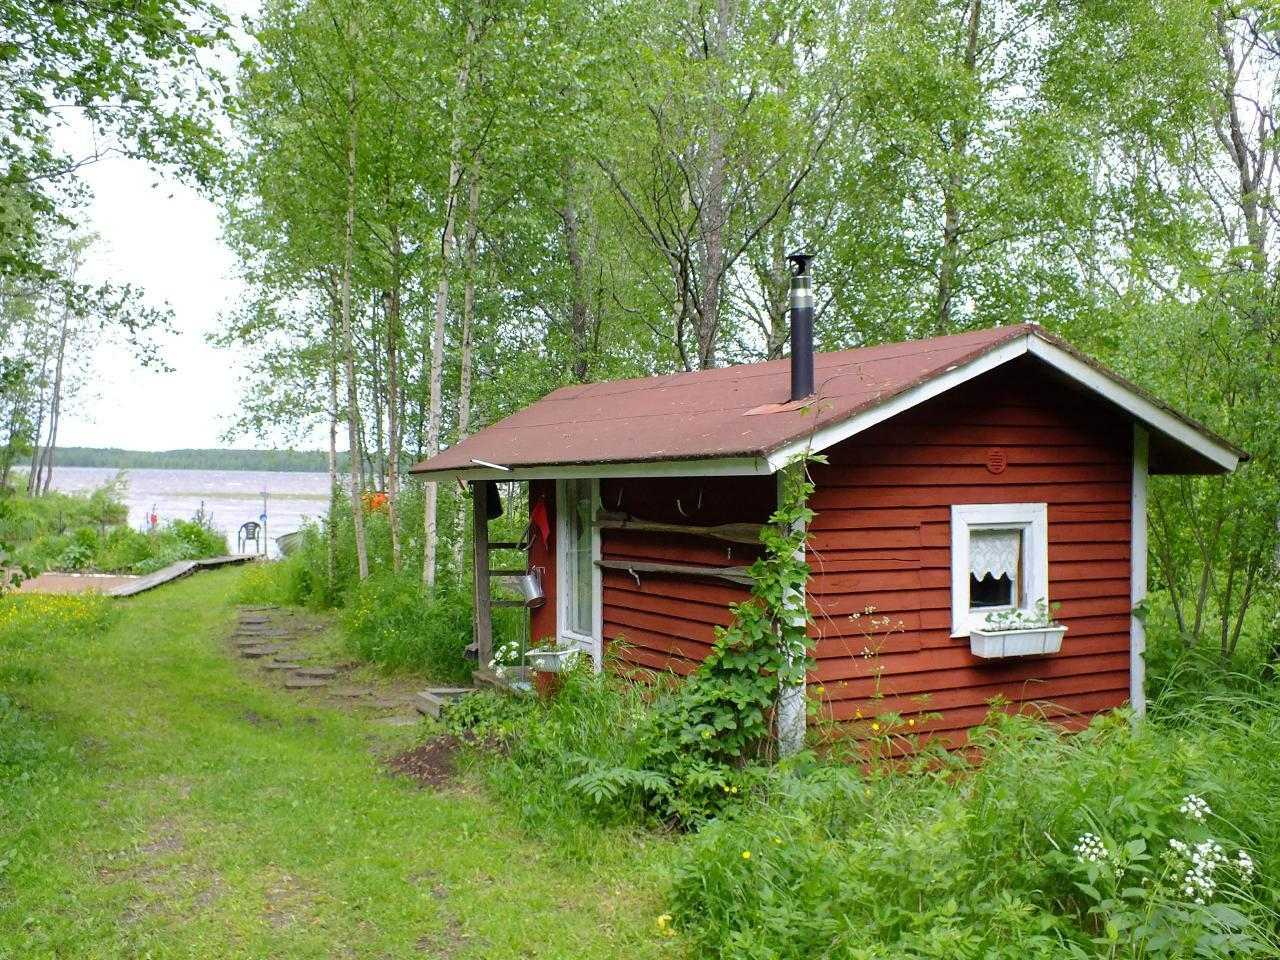 Ferienhaus - Mökki mit Sauna direkt am See  in Mouhijärvi-Sastamala (1707905), Mouhijärvi, , Westfinnland, Finnland, Bild 15